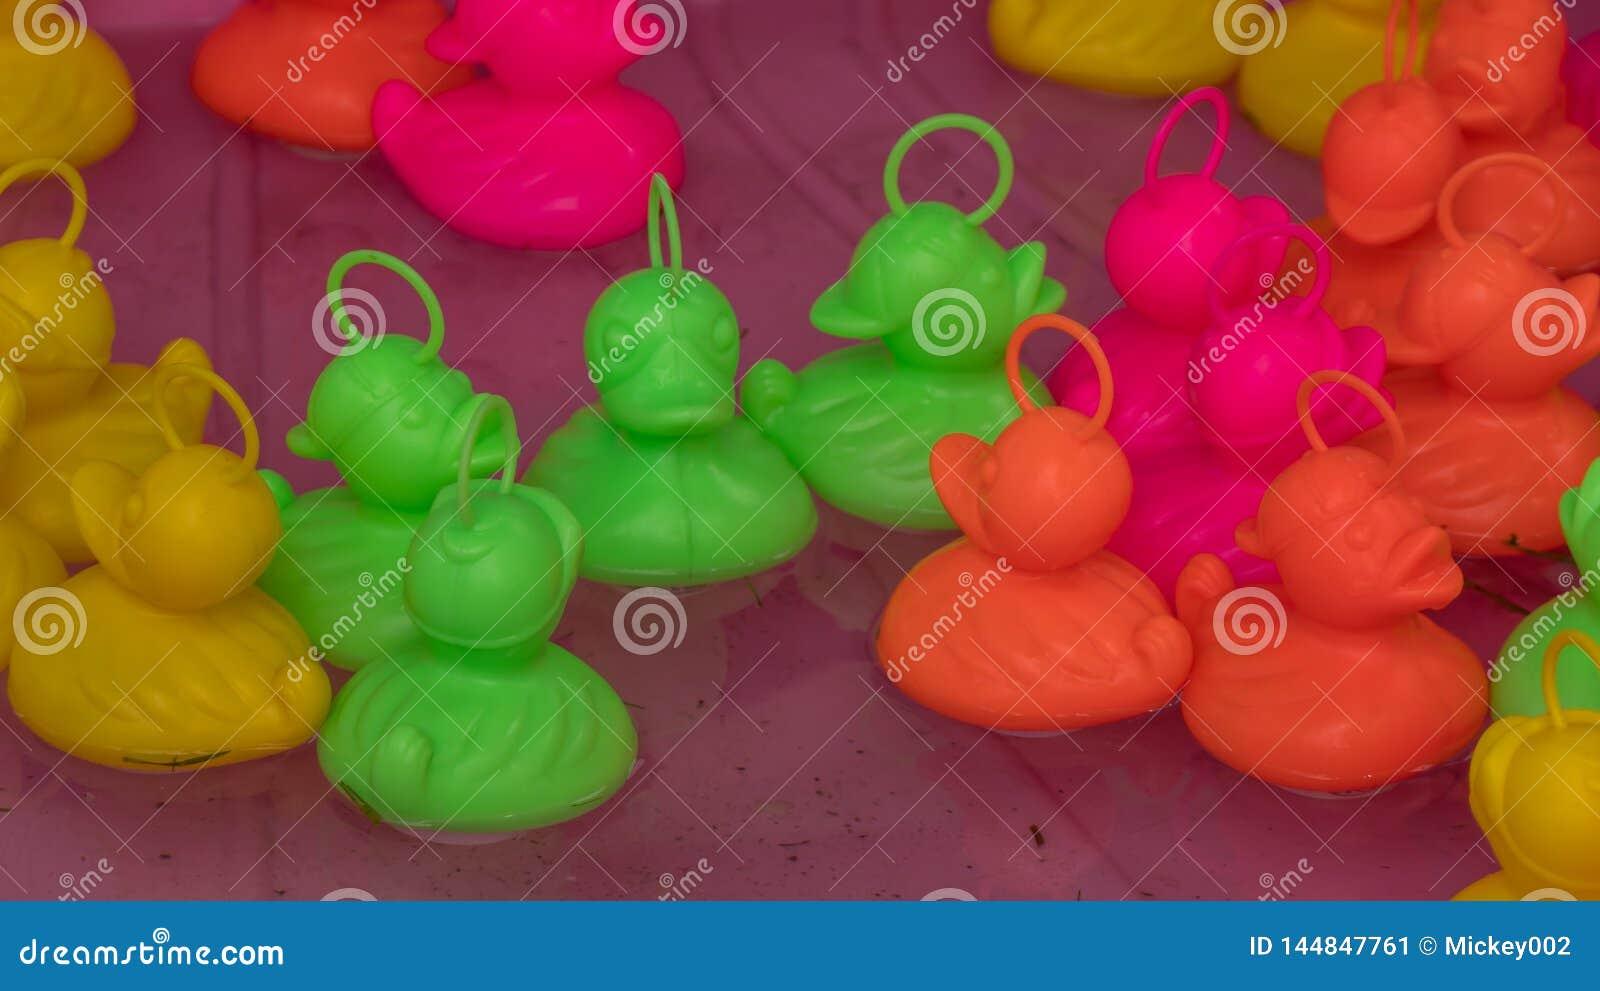 Floating plastic ducks